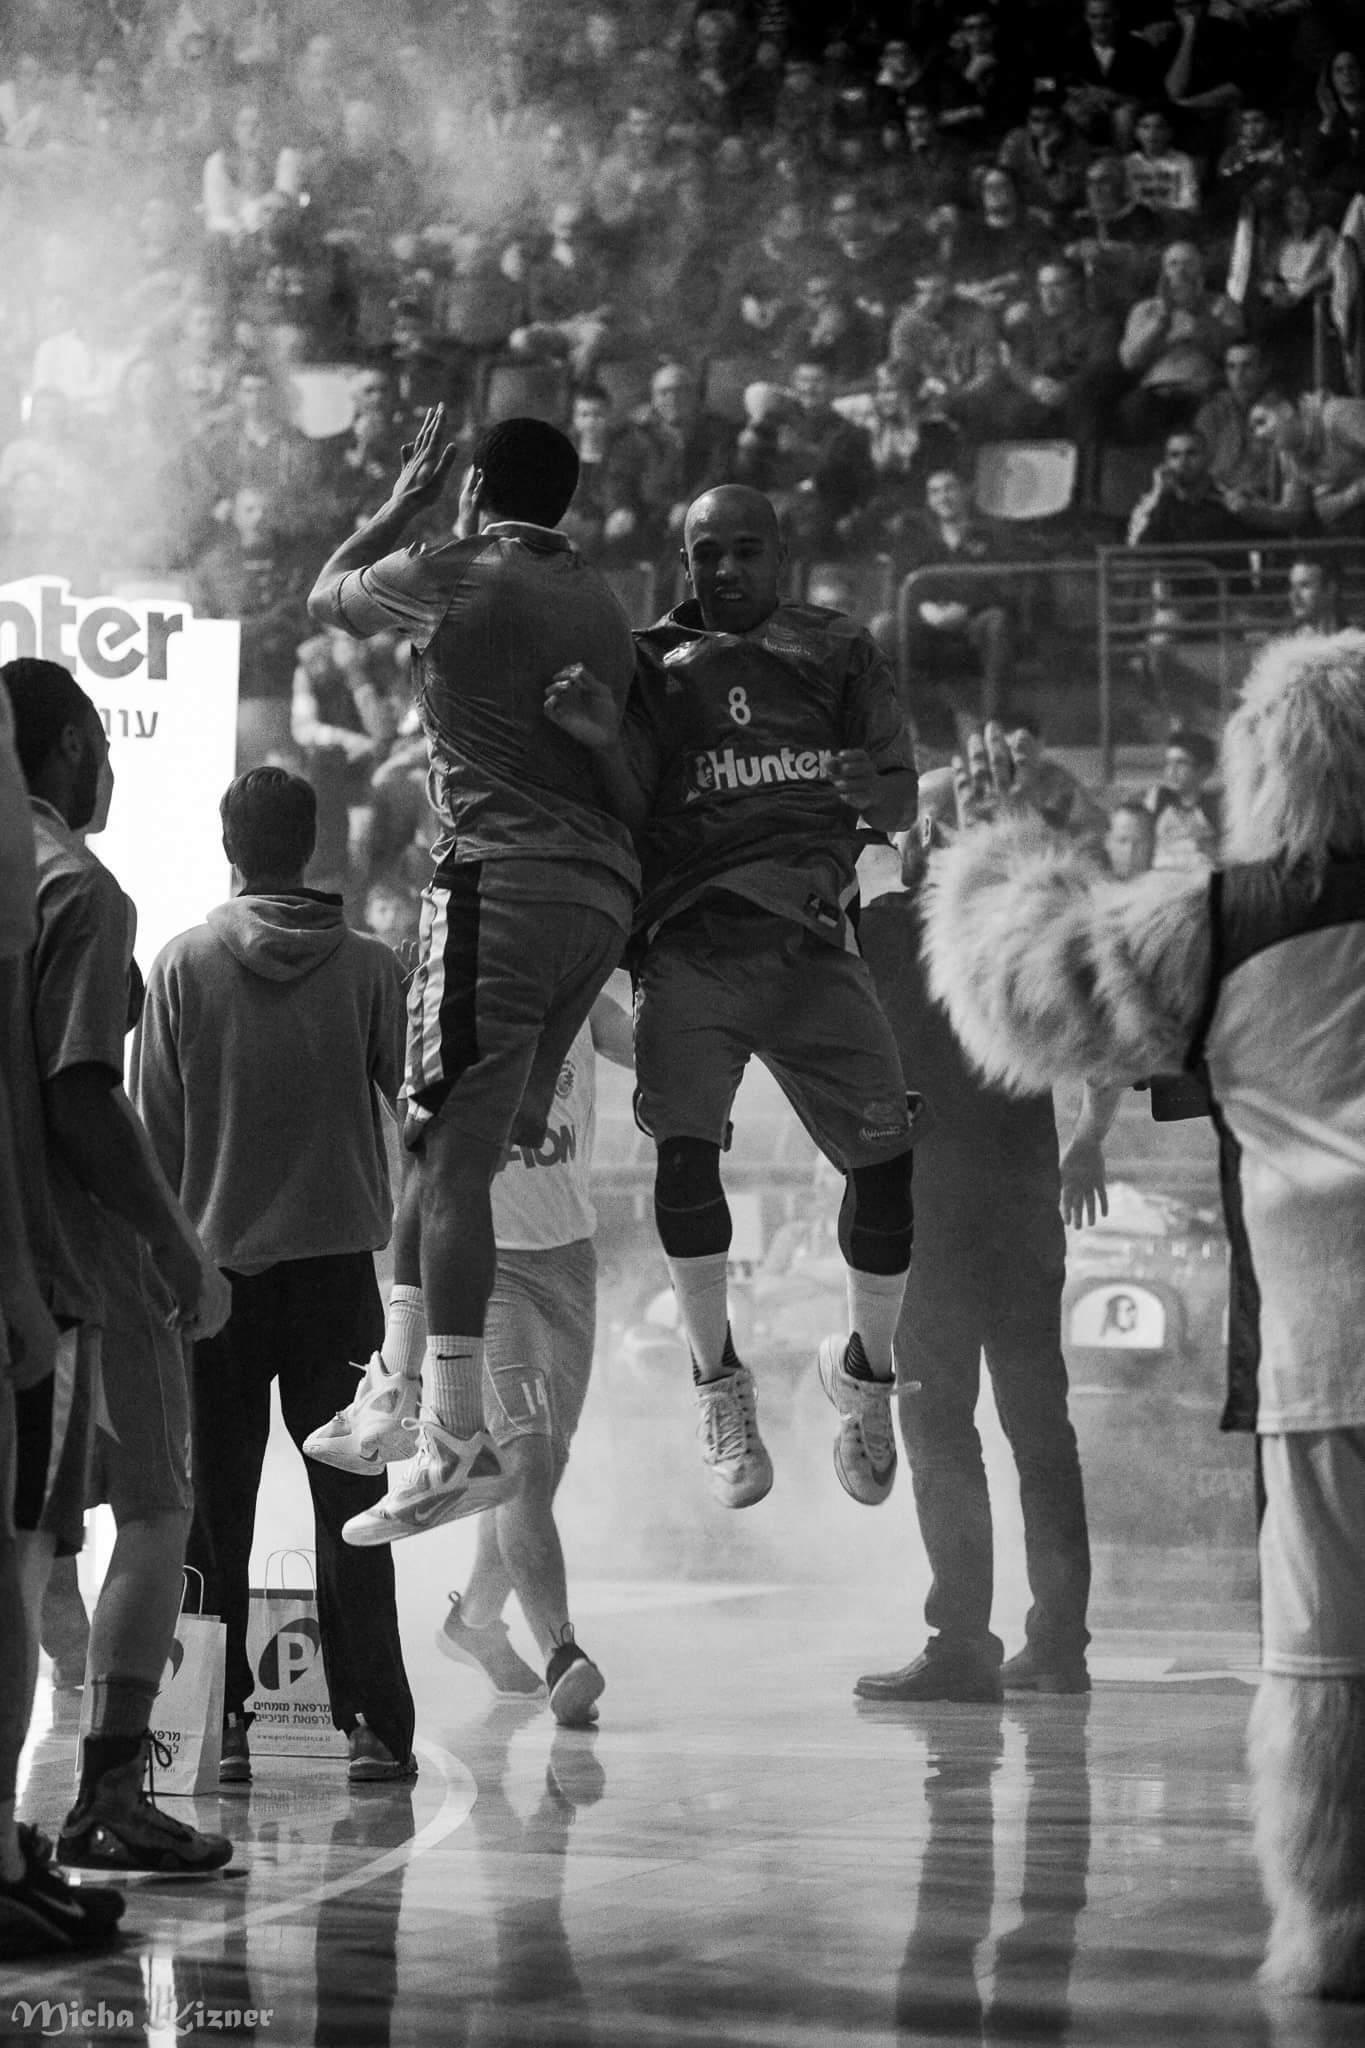 MACCABI HAIFA BASKETBALL TEAM by guy cohen - Illustrated by Yehonatan Cohen - Ourboox.com